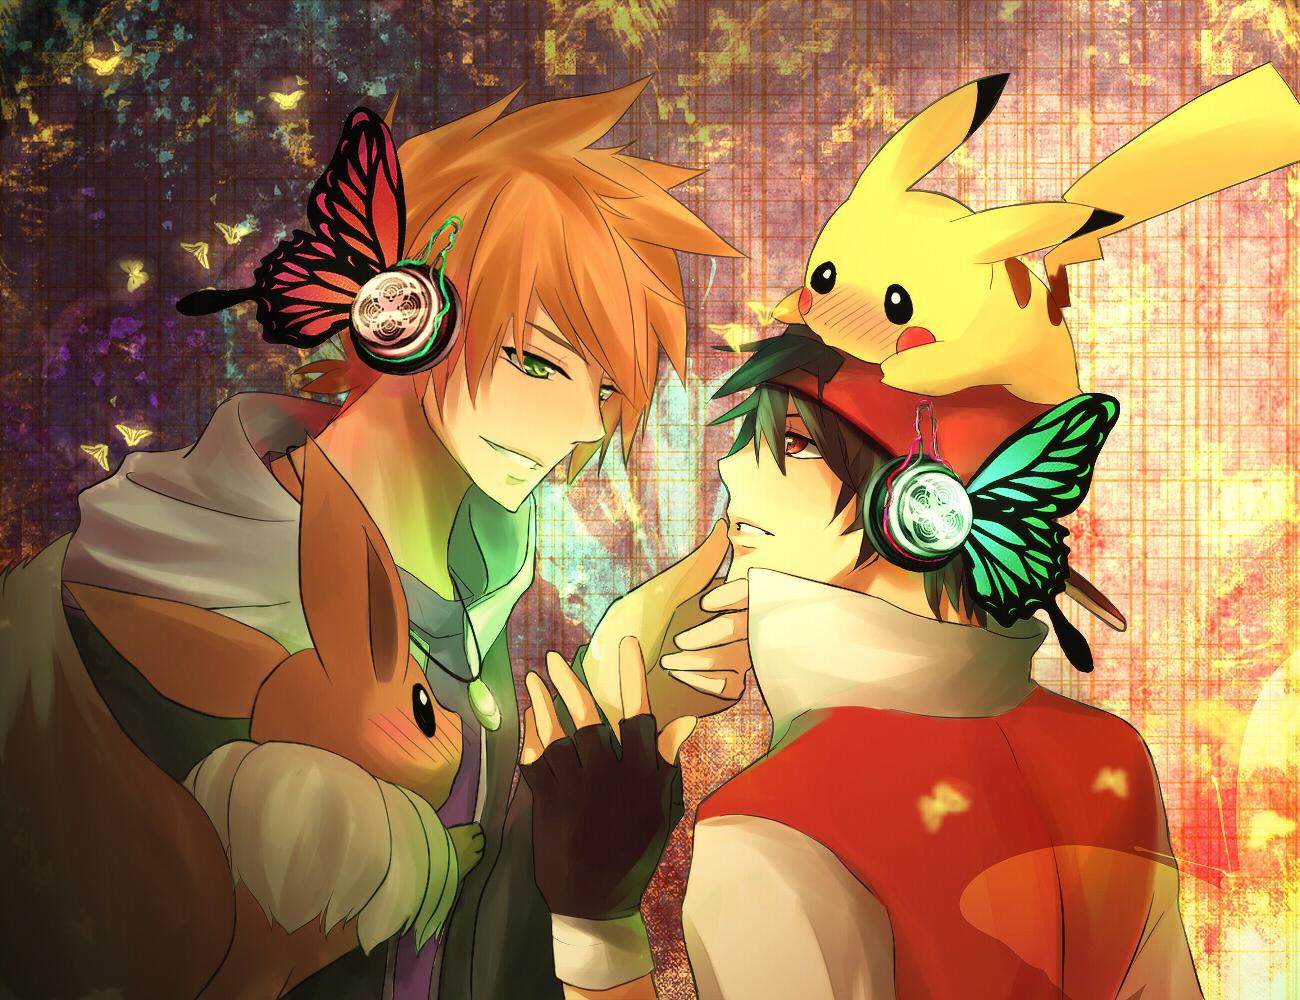 Magnet Vocaloid Image 1069202 Zerochan Anime Image